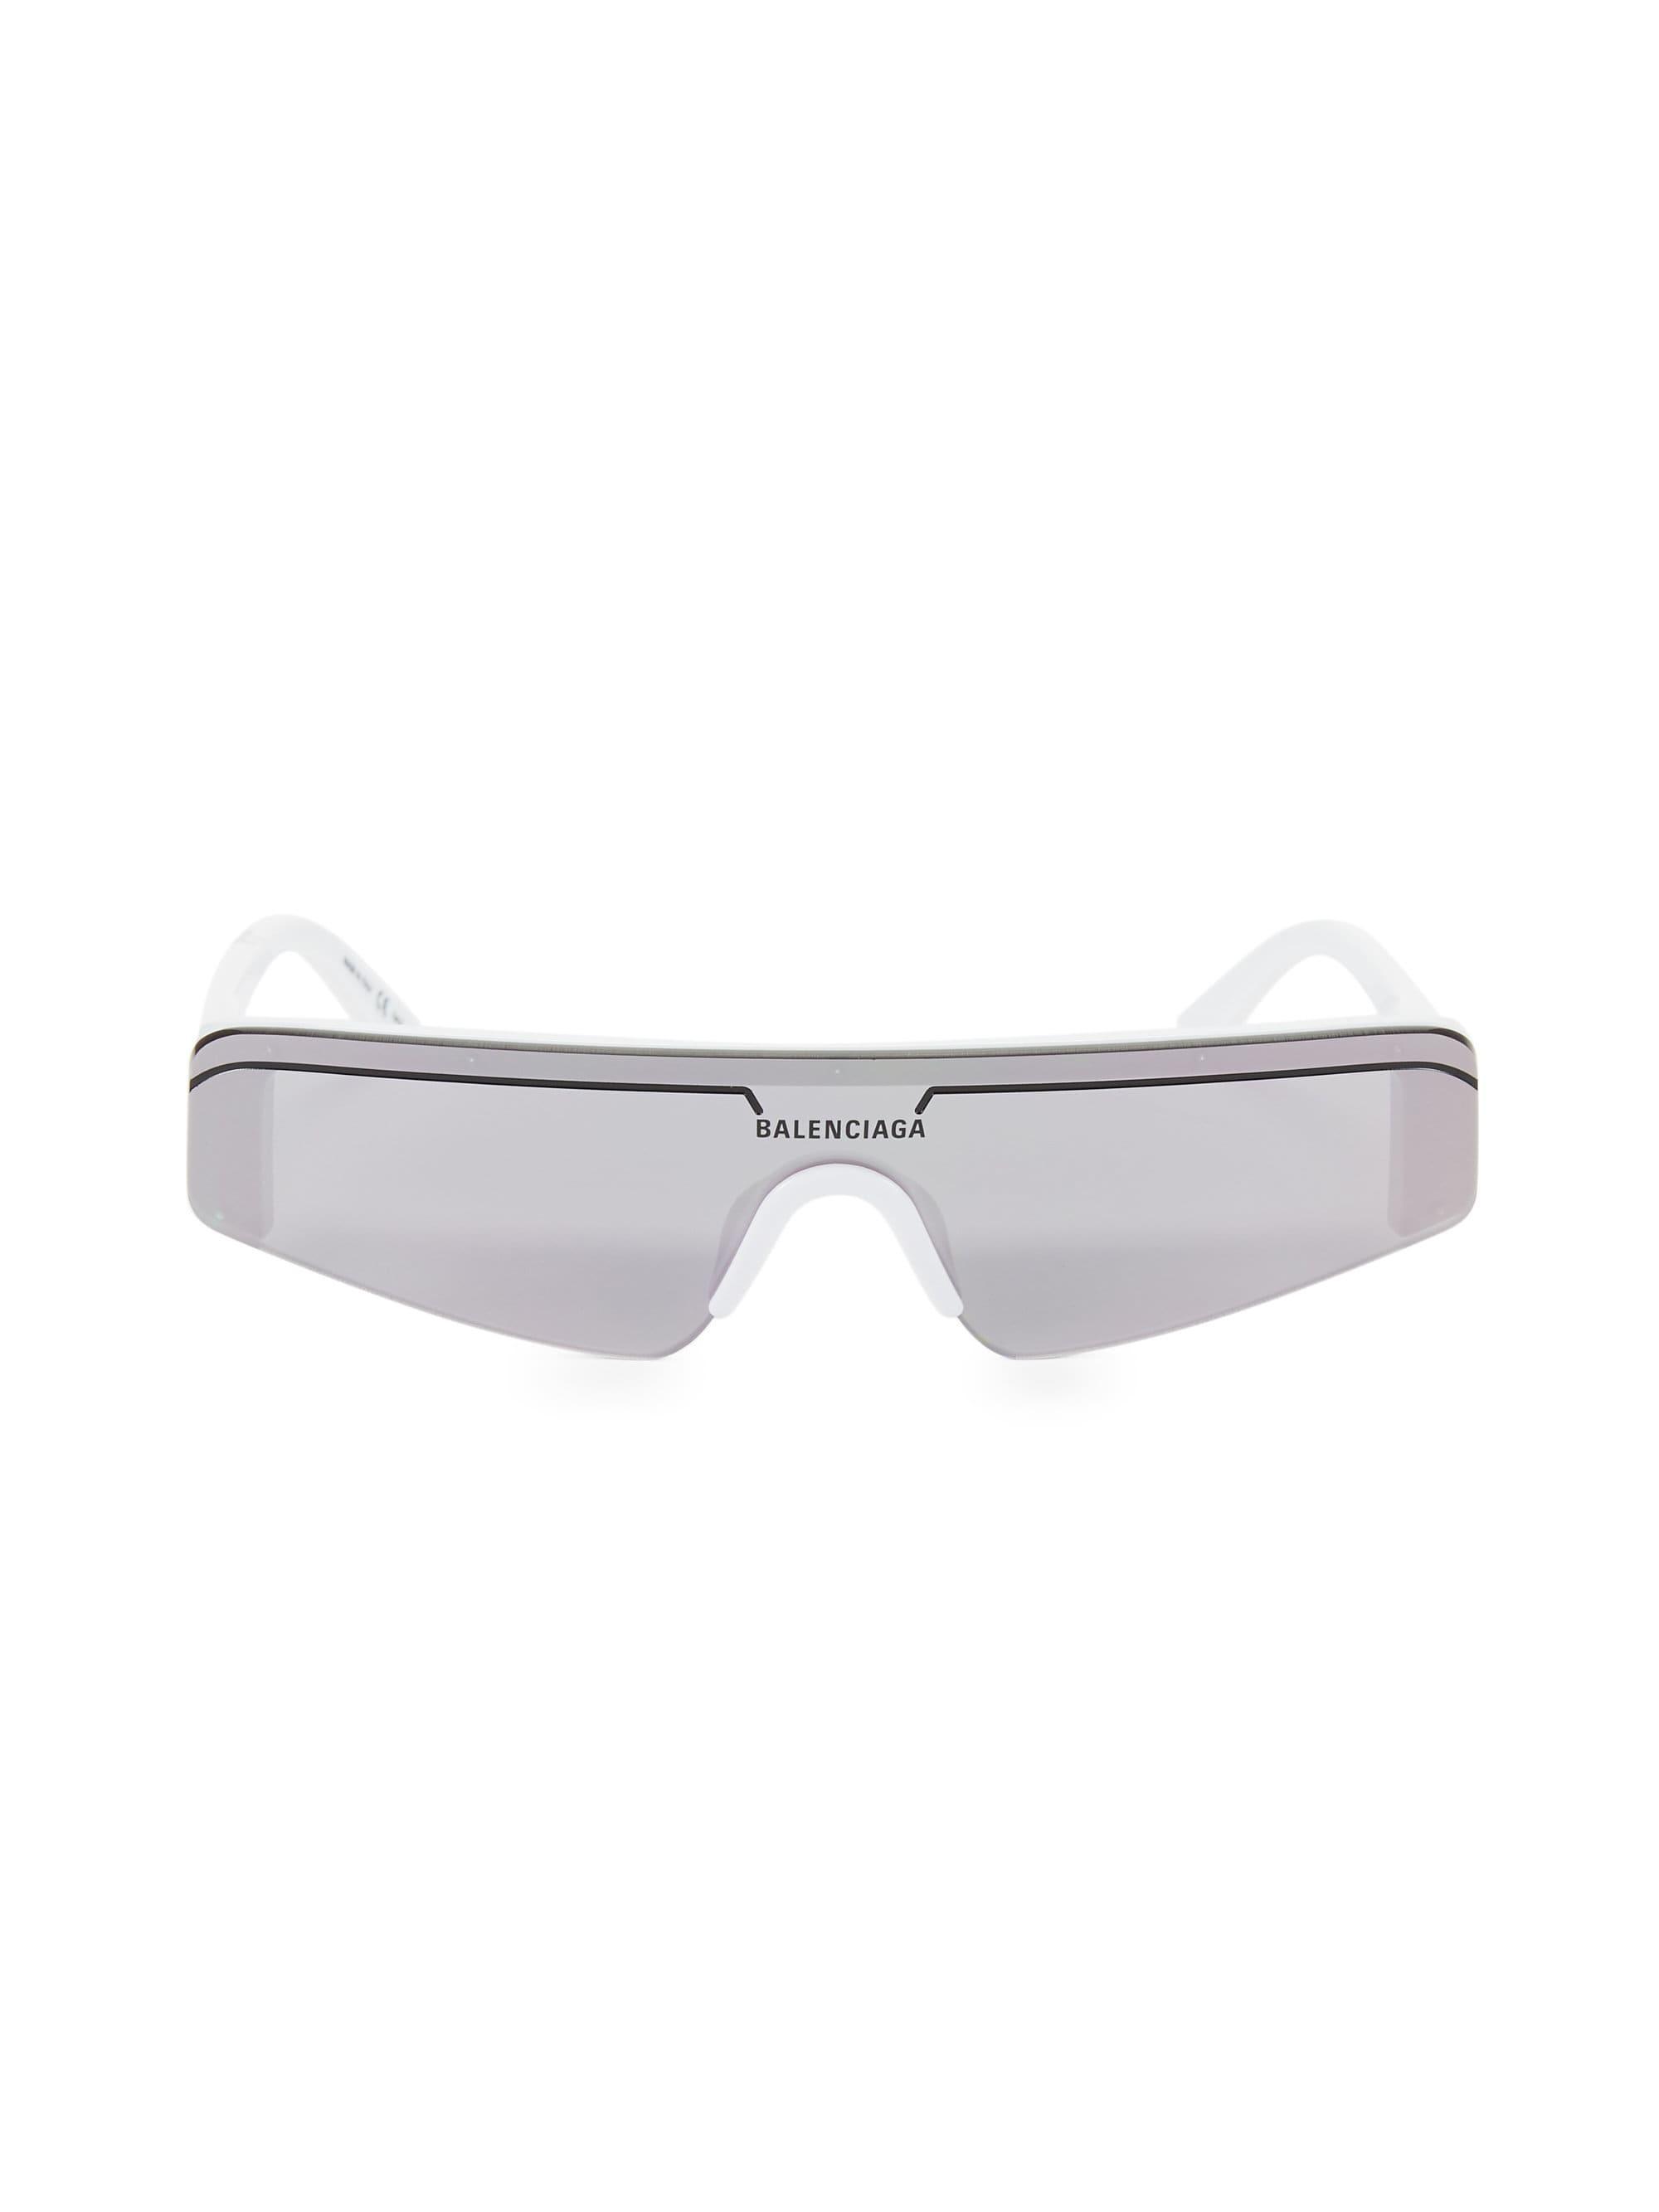 f39d2a7877 Lyst - Balenciaga 99mm Angular Shield Sunglasses in White for Men